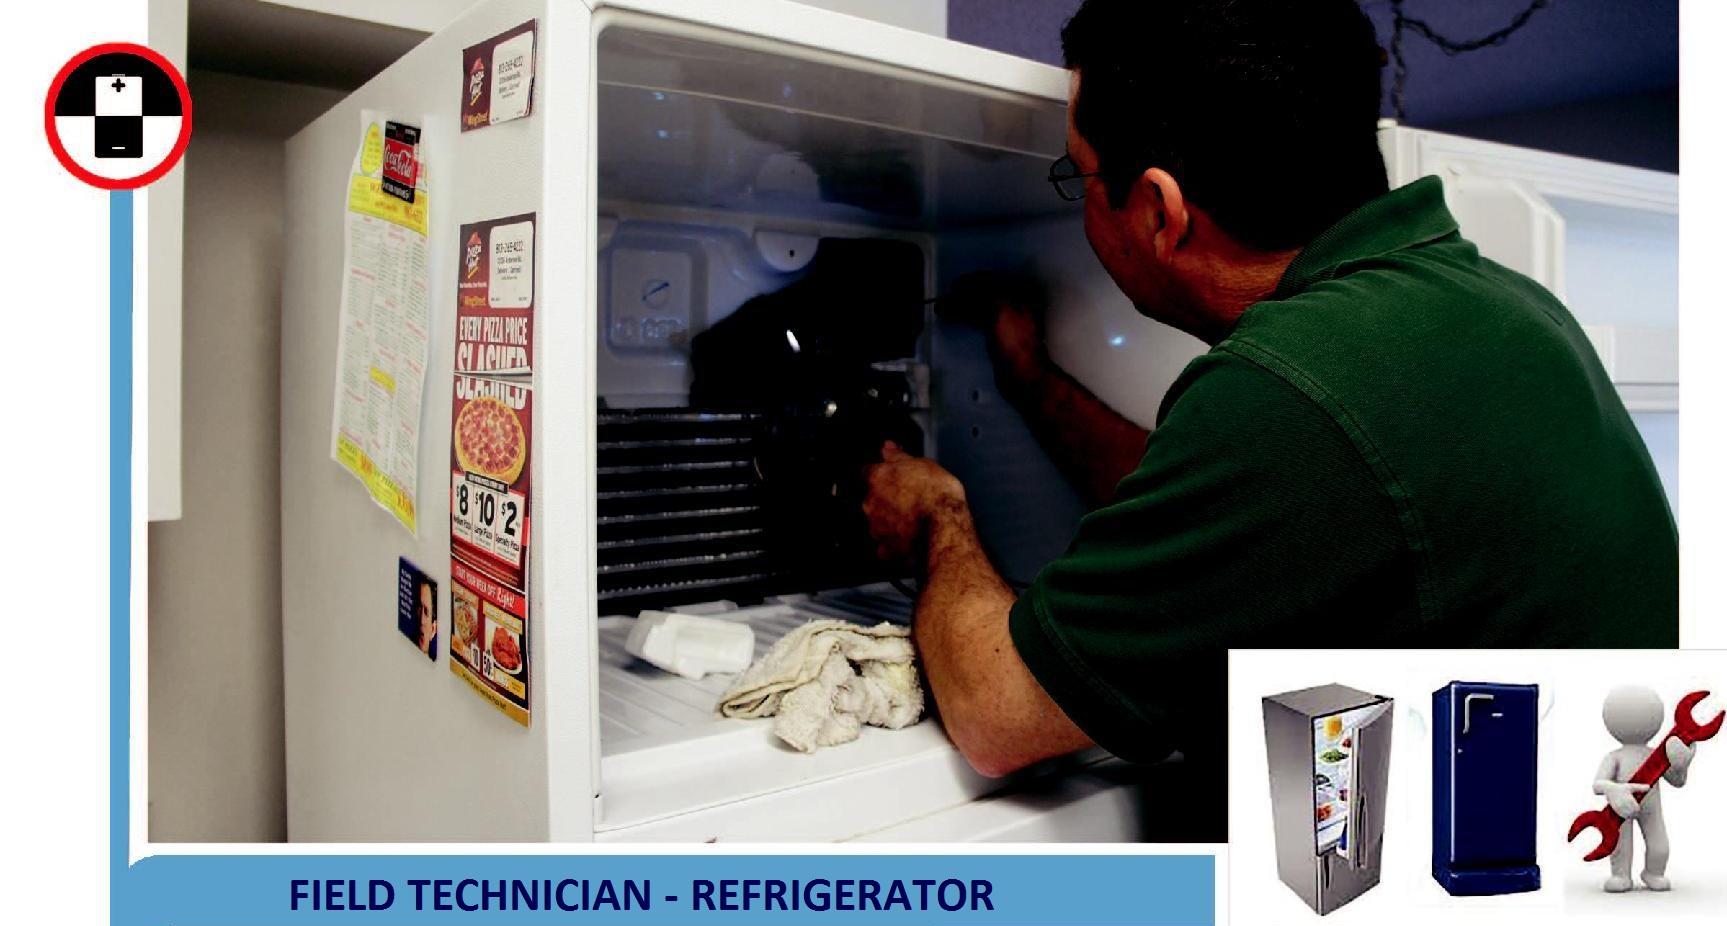 Field Technician - Refrigerator